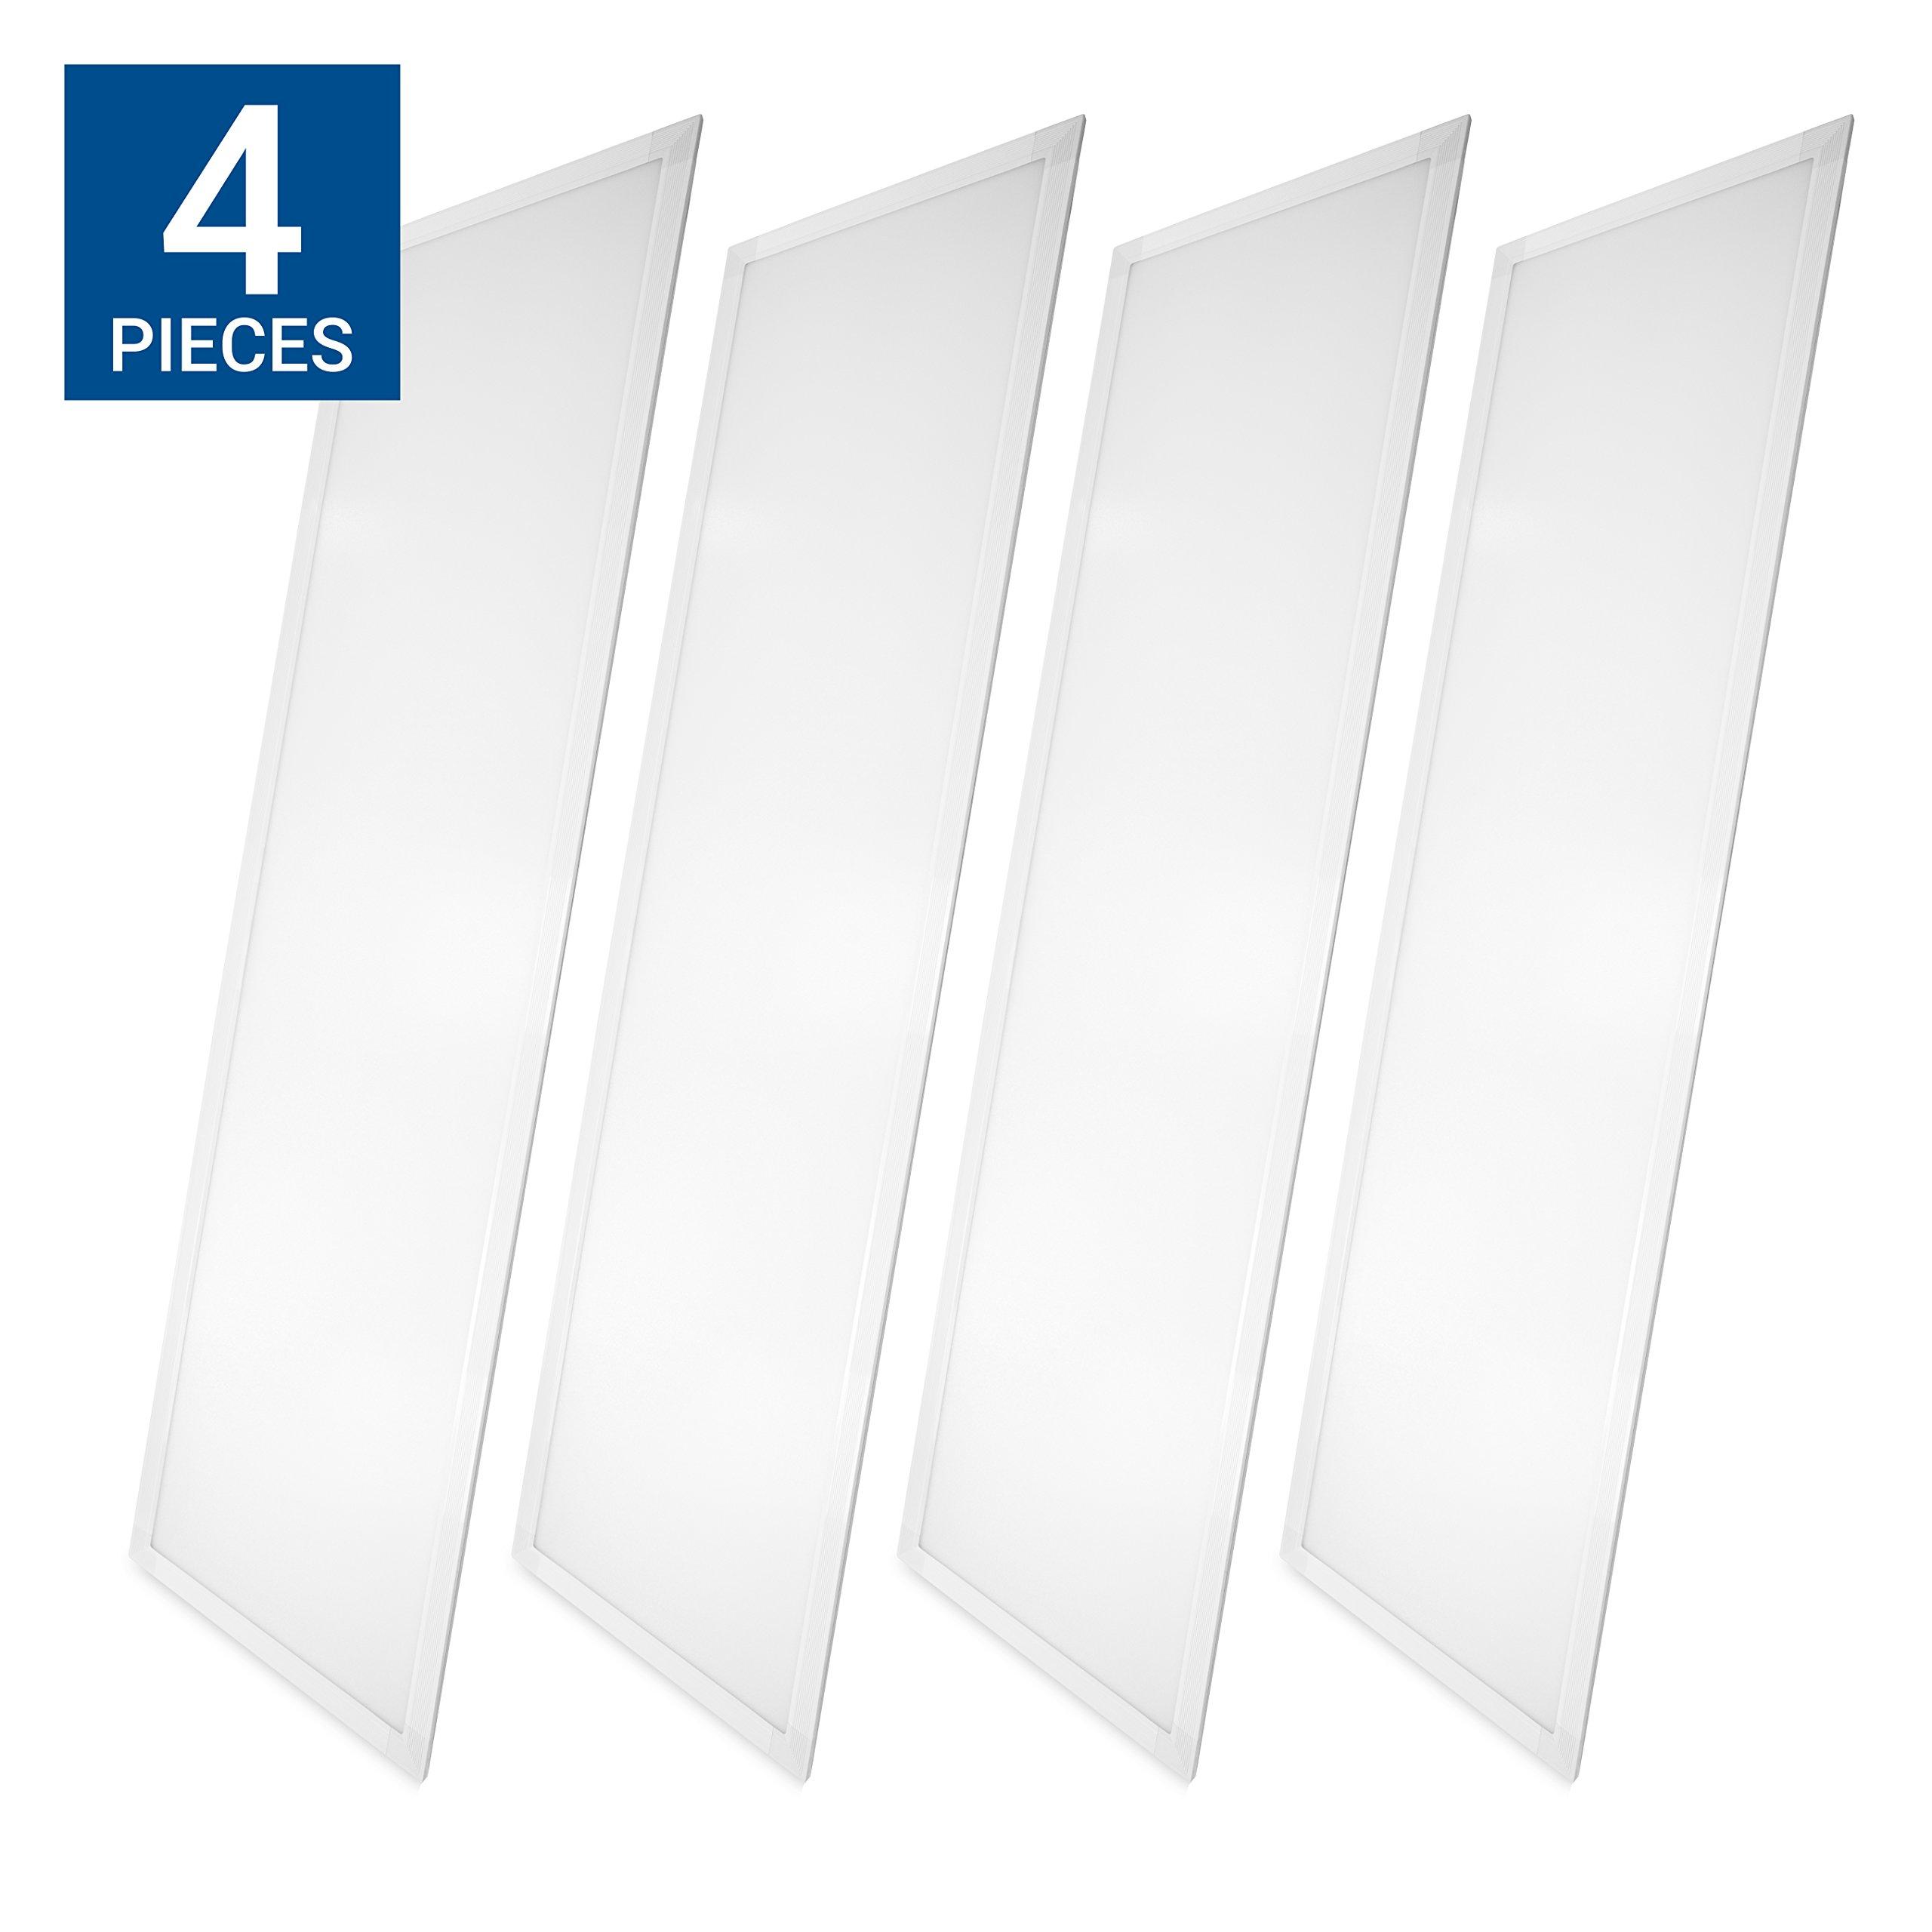 Hyperikon LED Troffer 2x4 Ft Panel Edge-Lit, Dimmable, 50W (200W Equivalency), 4000K Day Light, 6250 Lumens, Drop Ceiling Light, UL & DLC – Pack of 4